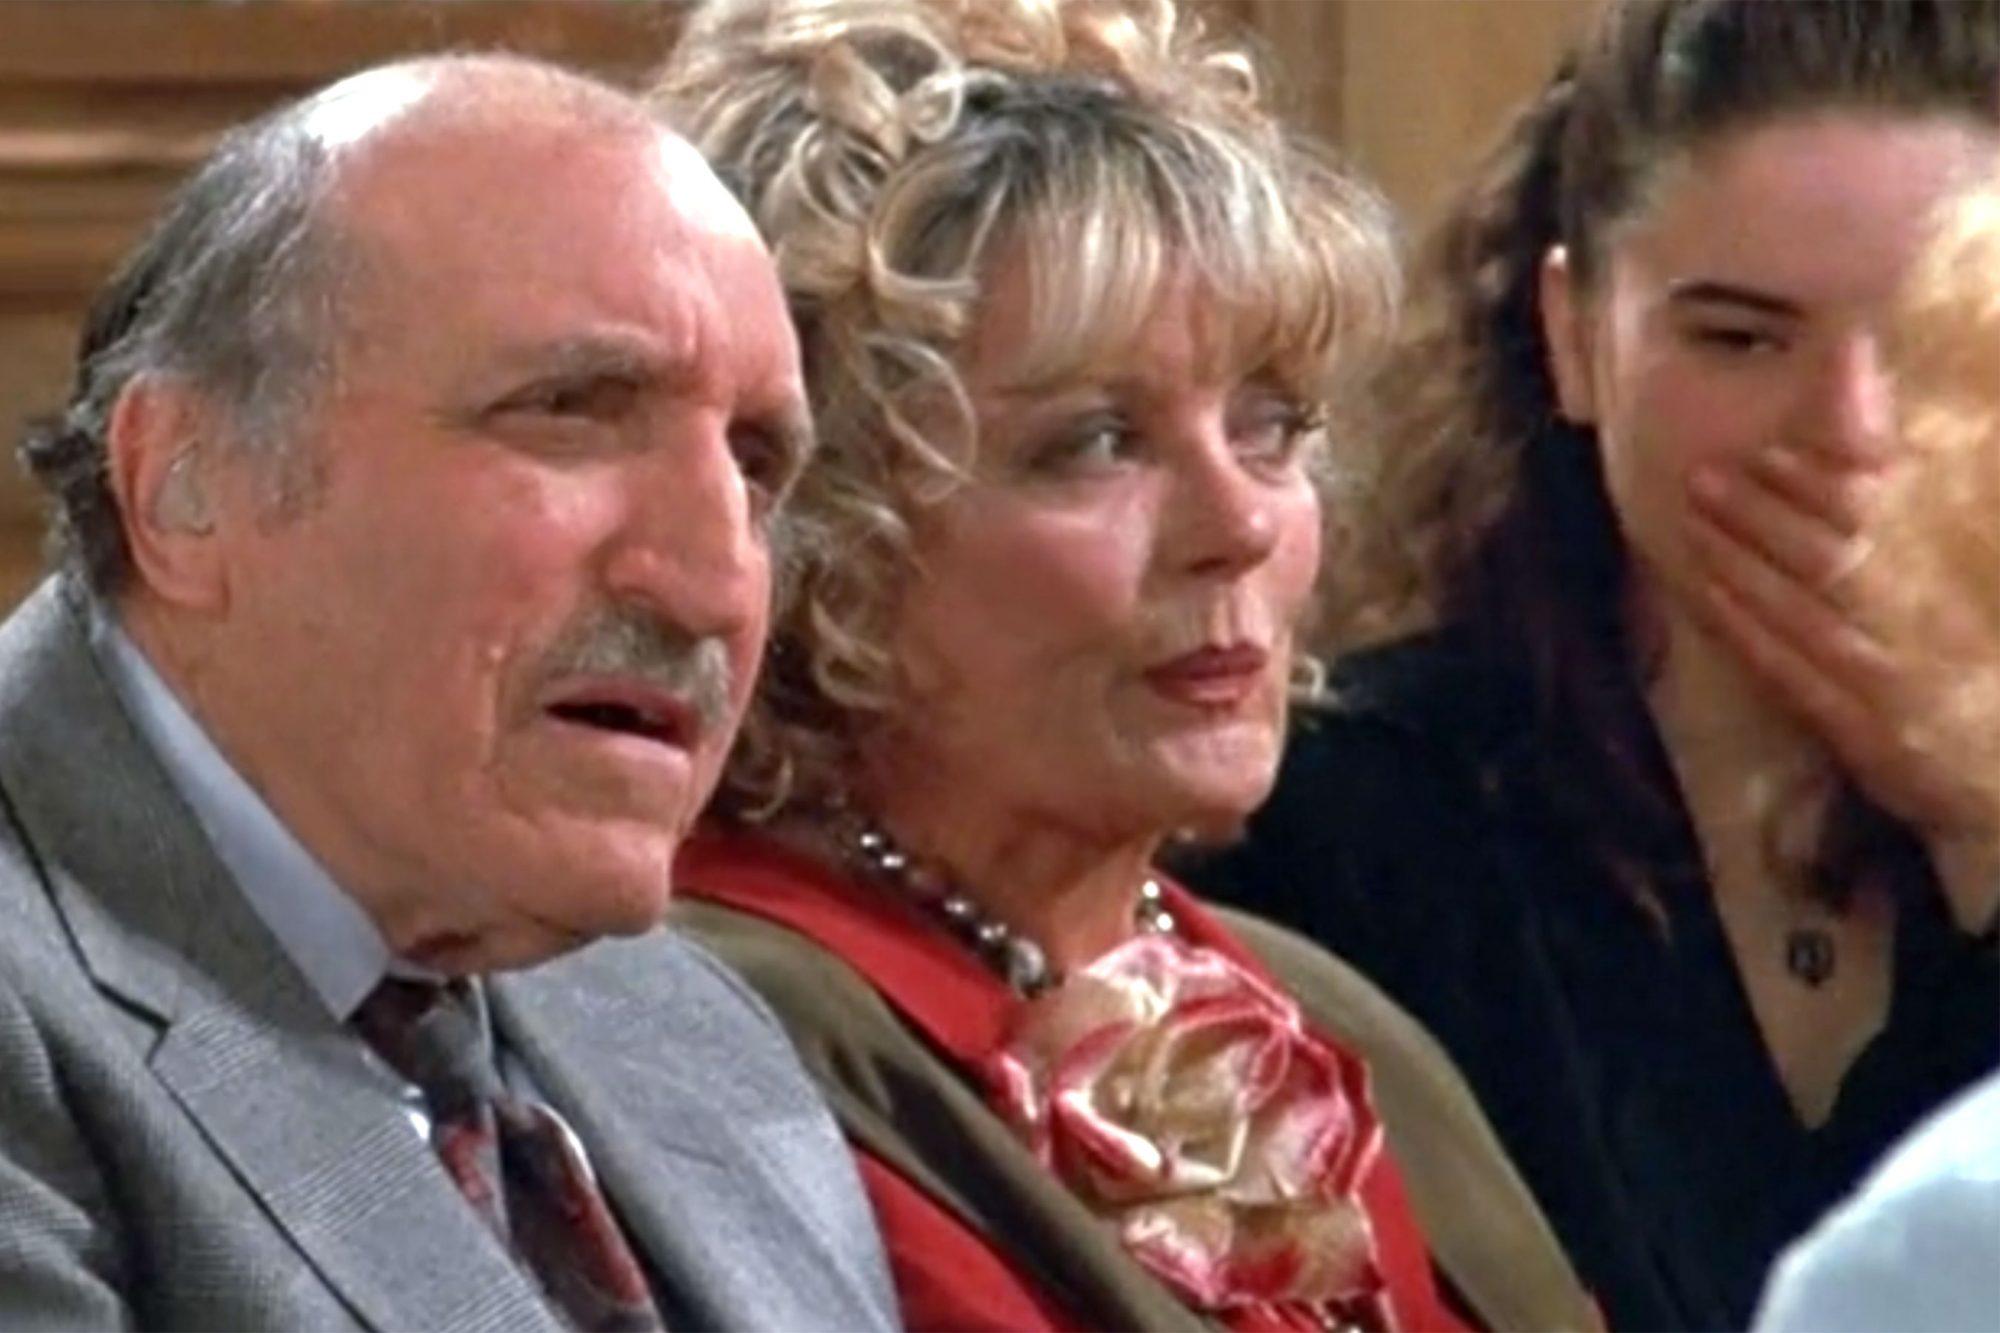 30. Sheree North as Babs Kramer